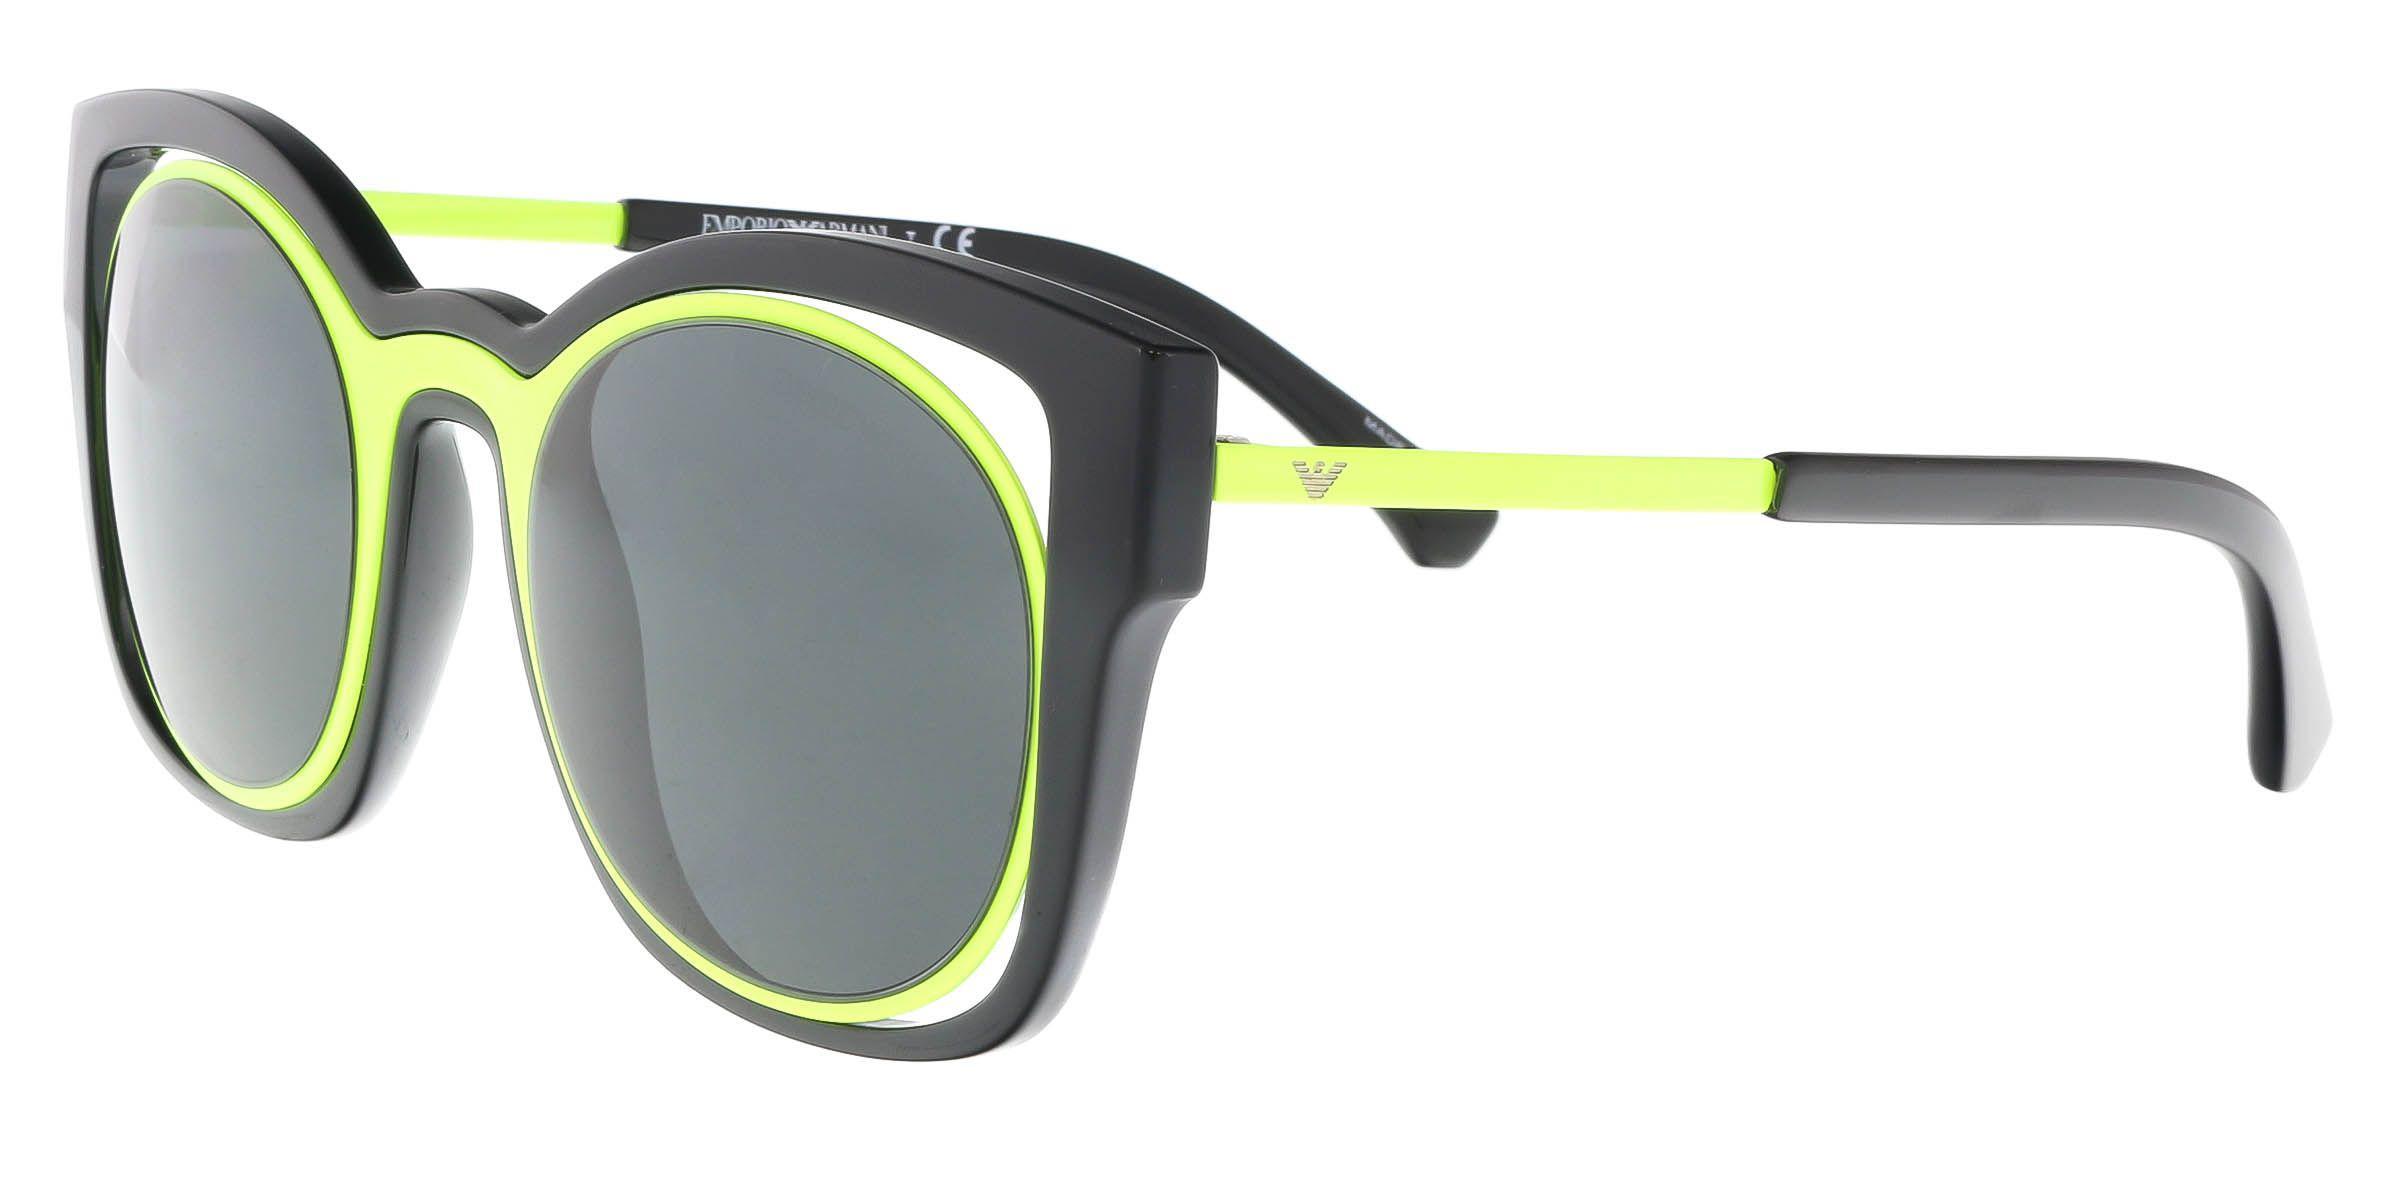 36d404a3d1a Lyst - Emporio Armani Ea4091 501787 Black lime Cat Eye Sunglasses in ...